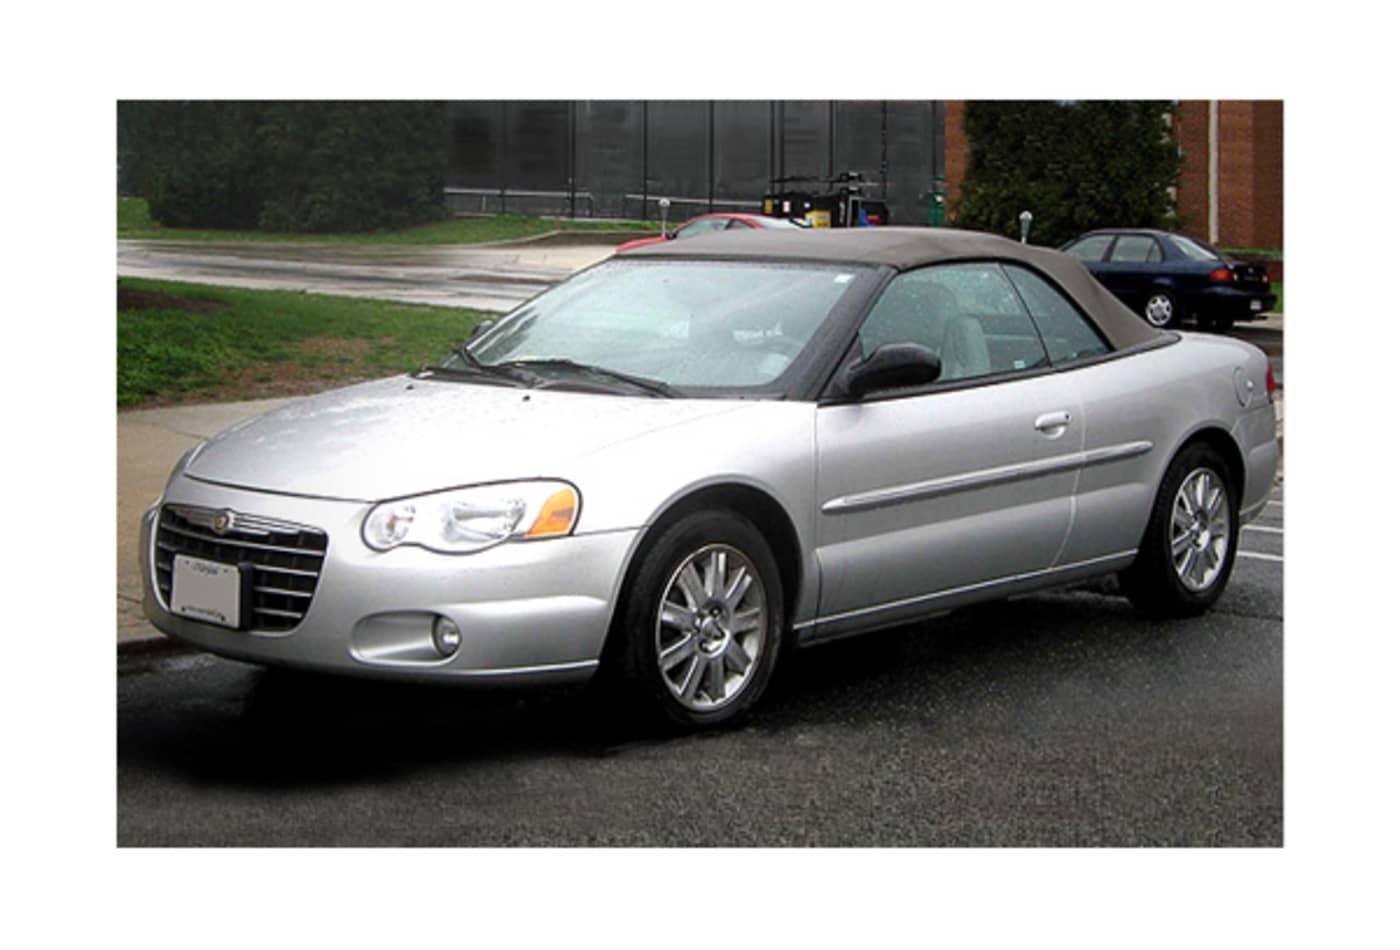 48438687 Chrysler-Sebring-Convertible-Most-Stolen-Luxury-Cars-CNBC.jpg